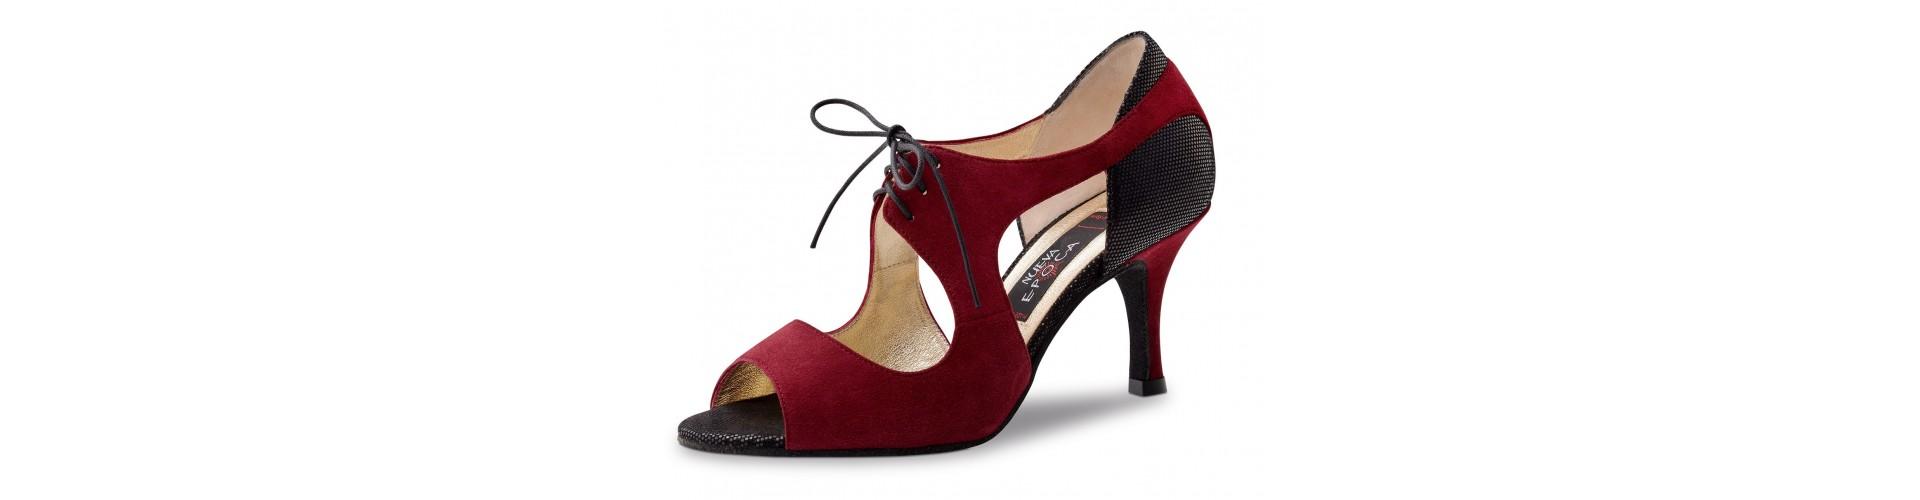 Chaussures de danse femme